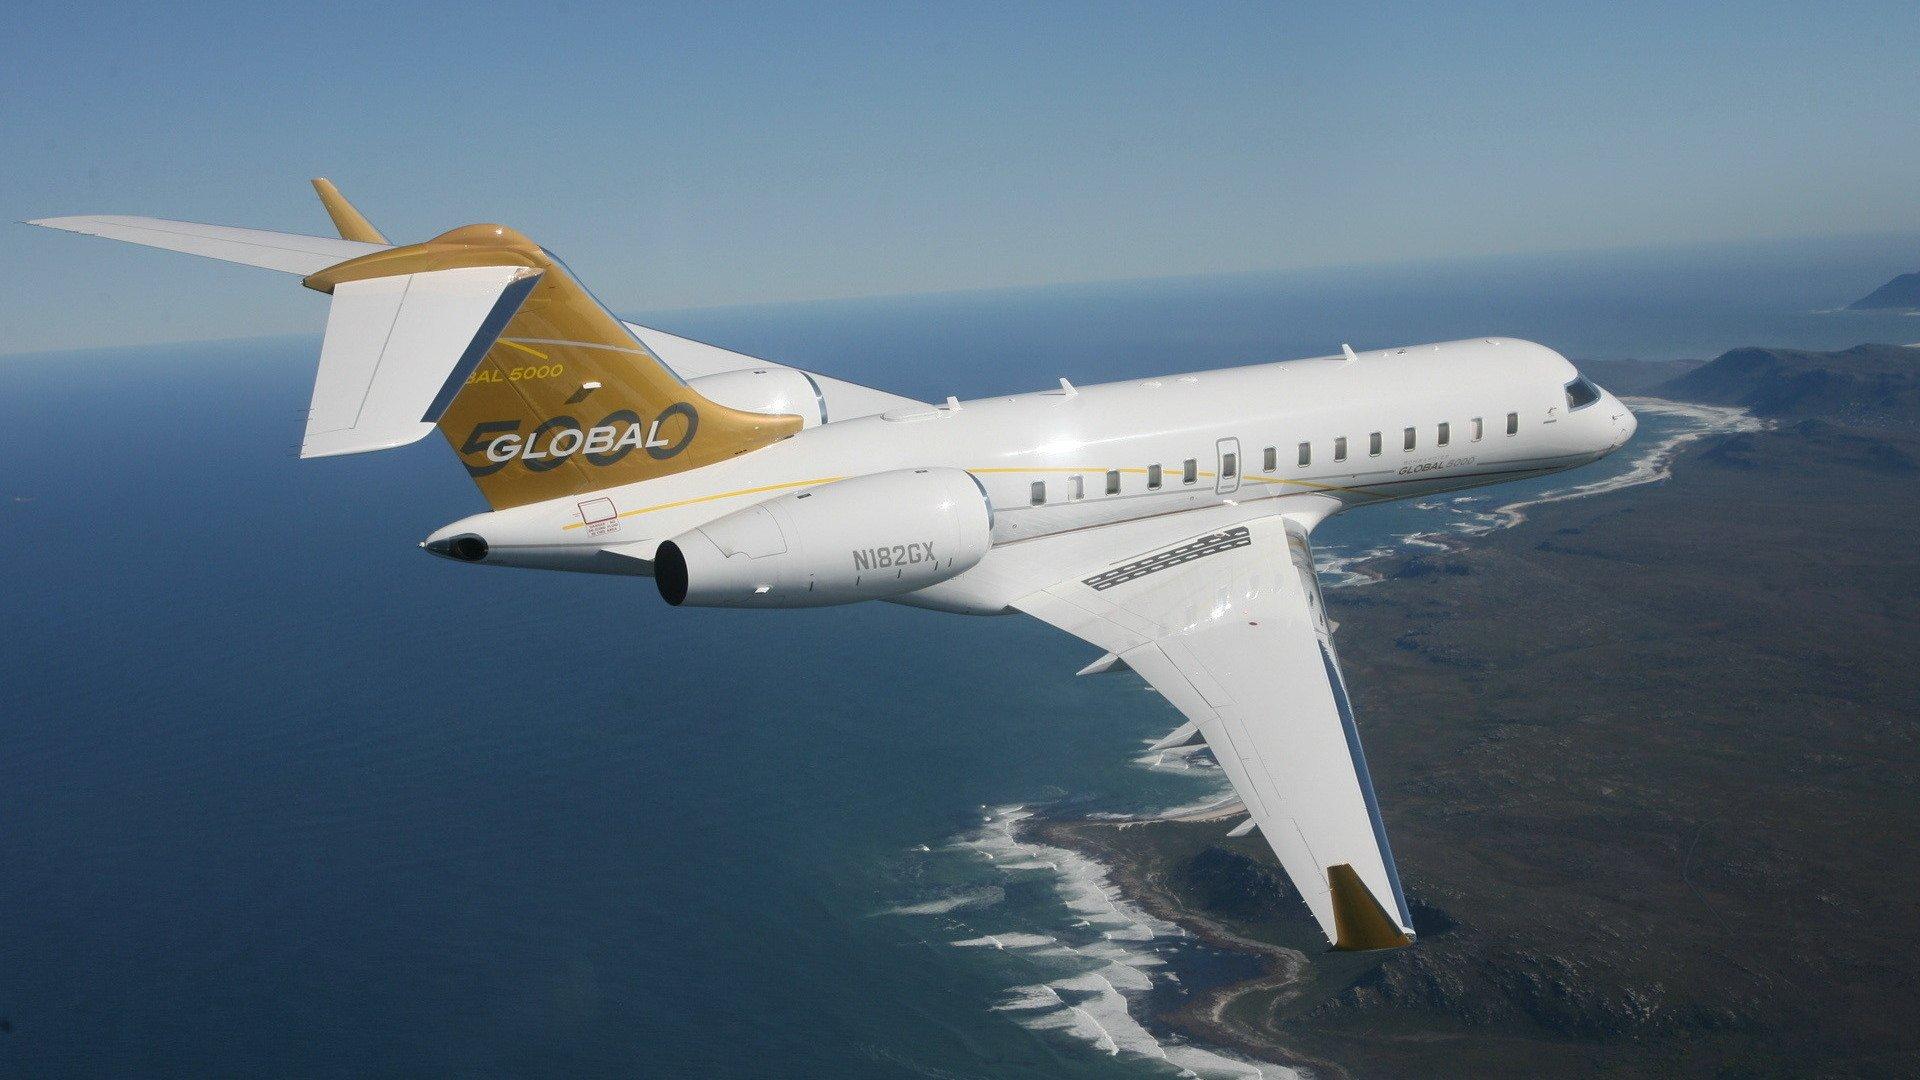 座驾 - Bombardier Global Express  壁纸